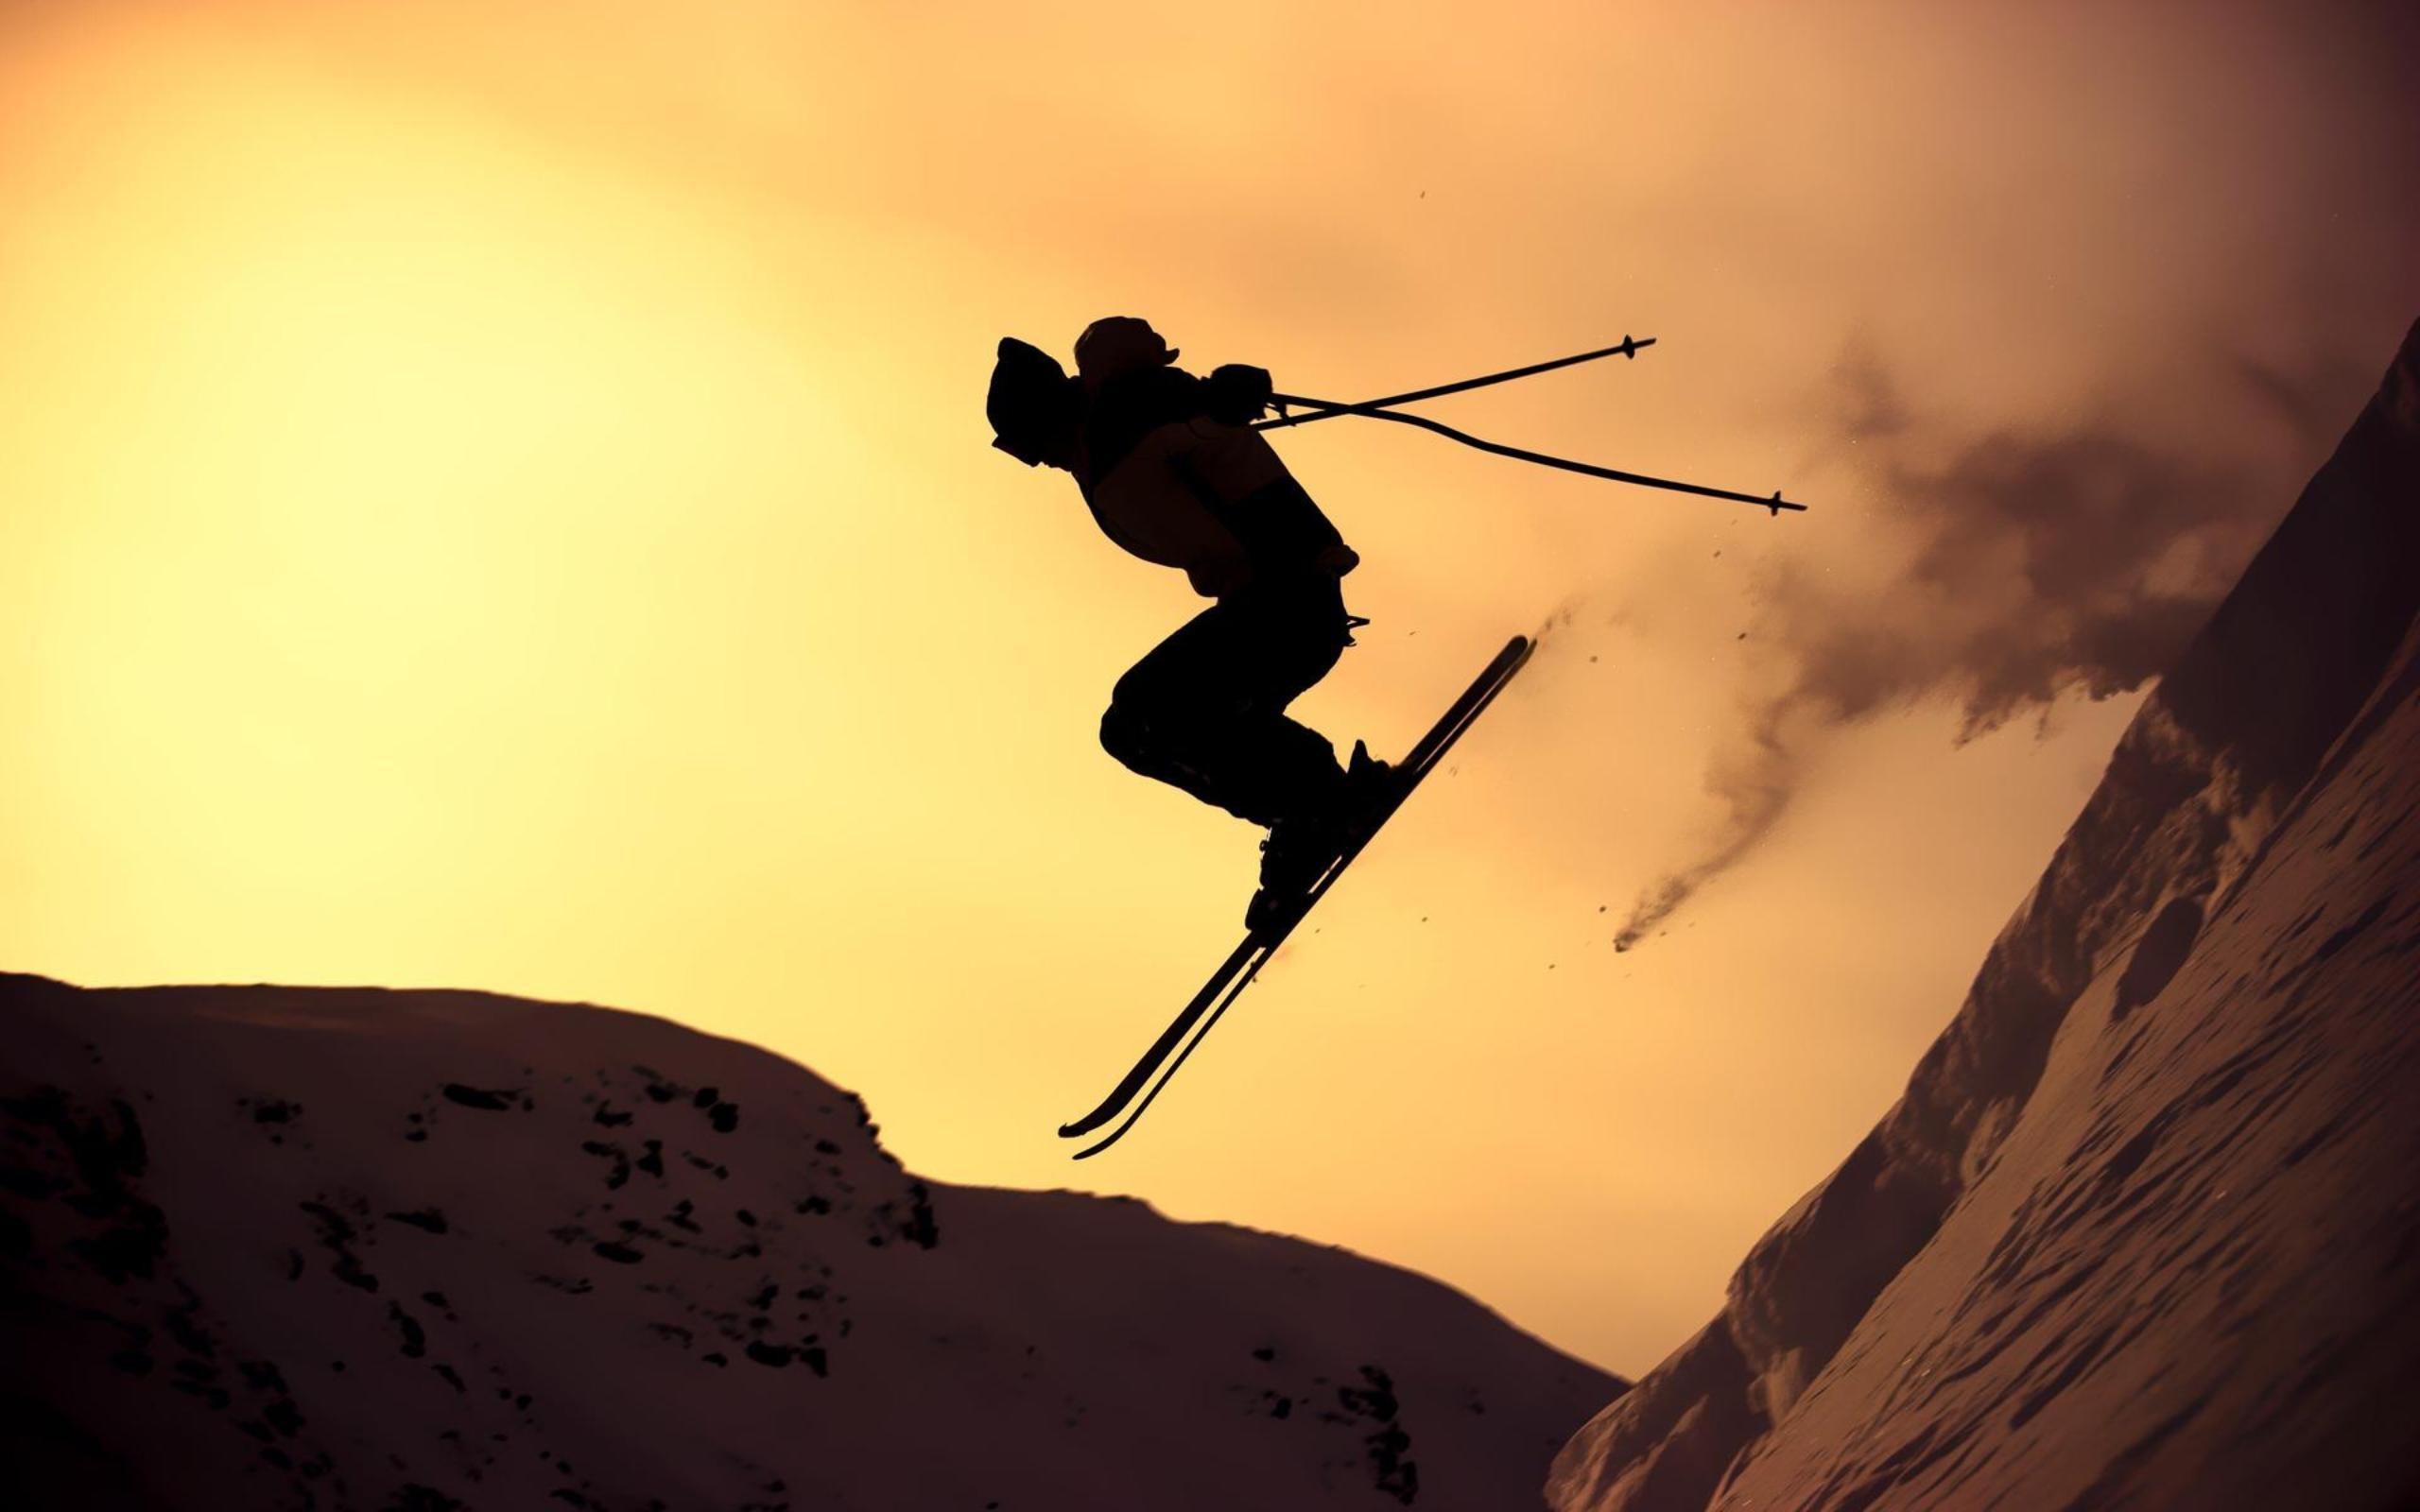 Skii al atardecer - 2560x1600